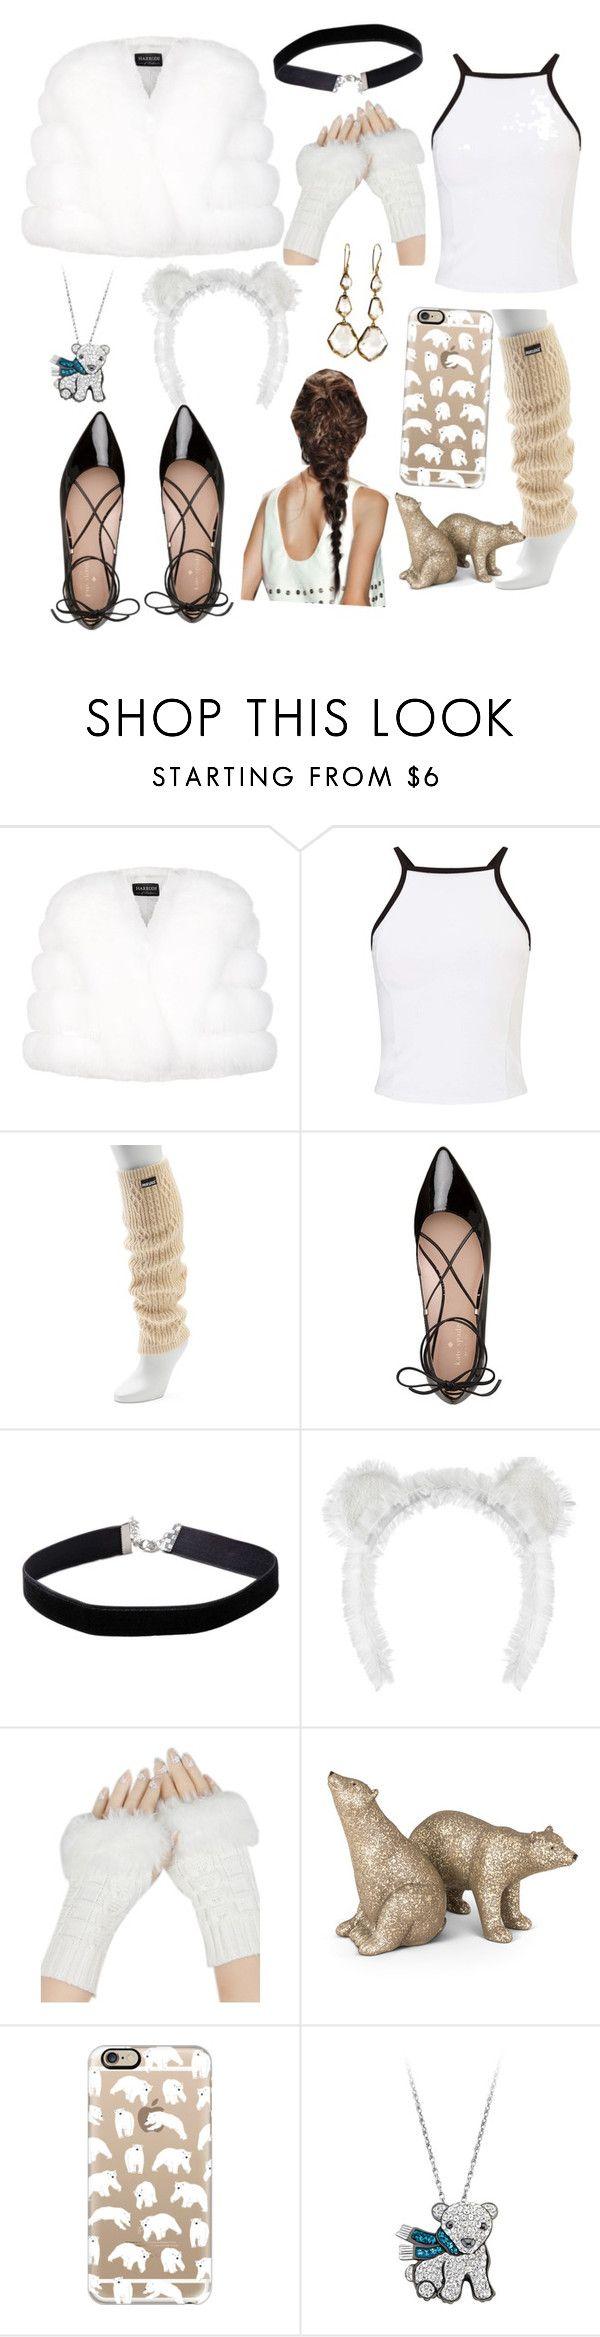 """Polar bear last minute Halloween costume"" by fiercekitten ❤ liked on Polyvore featuring Harrods, Miss Selfridge, Muk Luks, Kate Spade, Casetify and Ippolita"